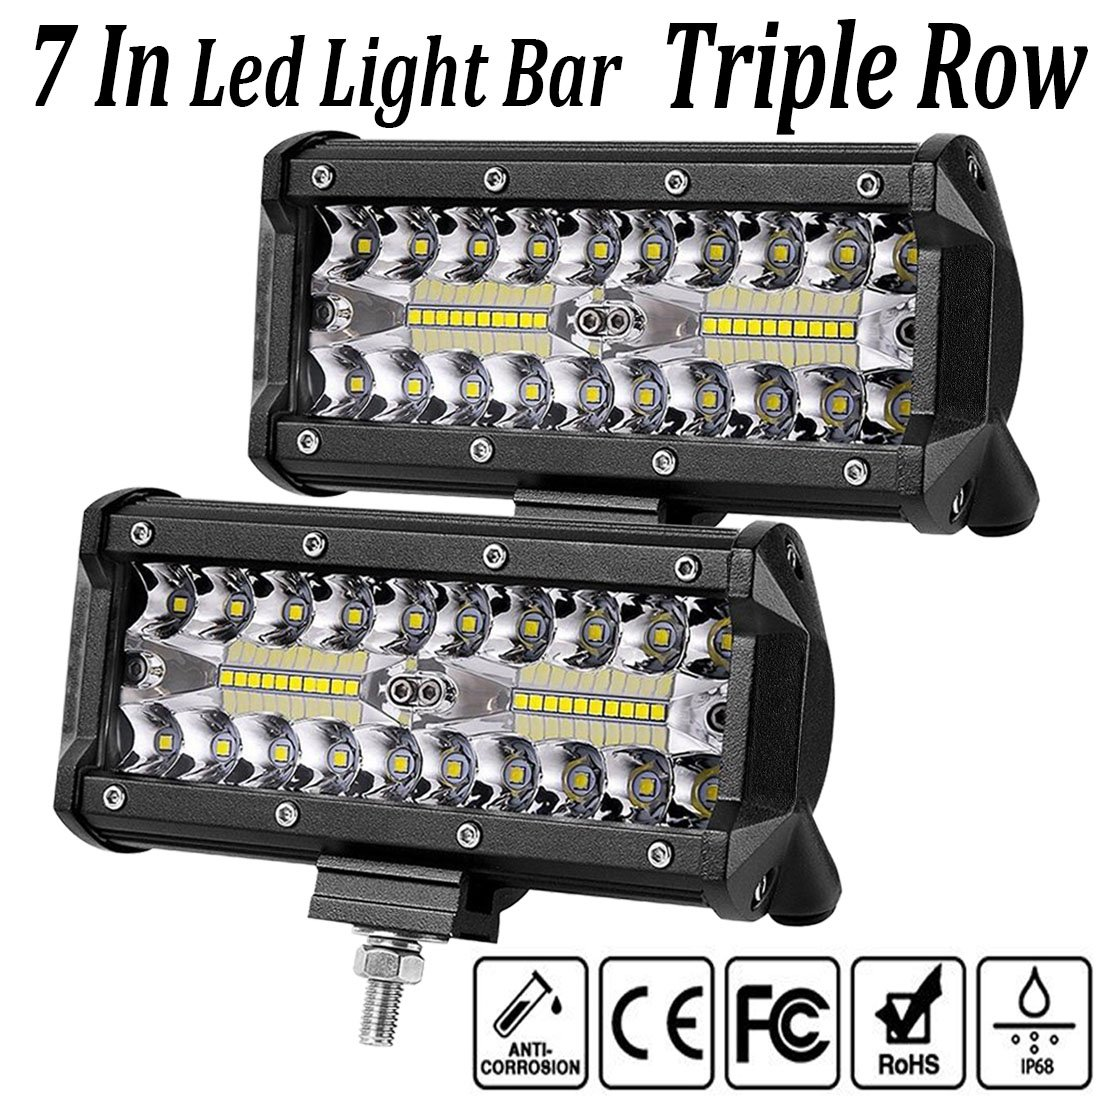 LED Light Bar,7 Inch 2PCS LED Flood Light Pods Work Light Bar LED Pod Lights Spot Beam Driving Fog Lights Triple Row Cubes Lights for Jeep Off-road Truck Boat